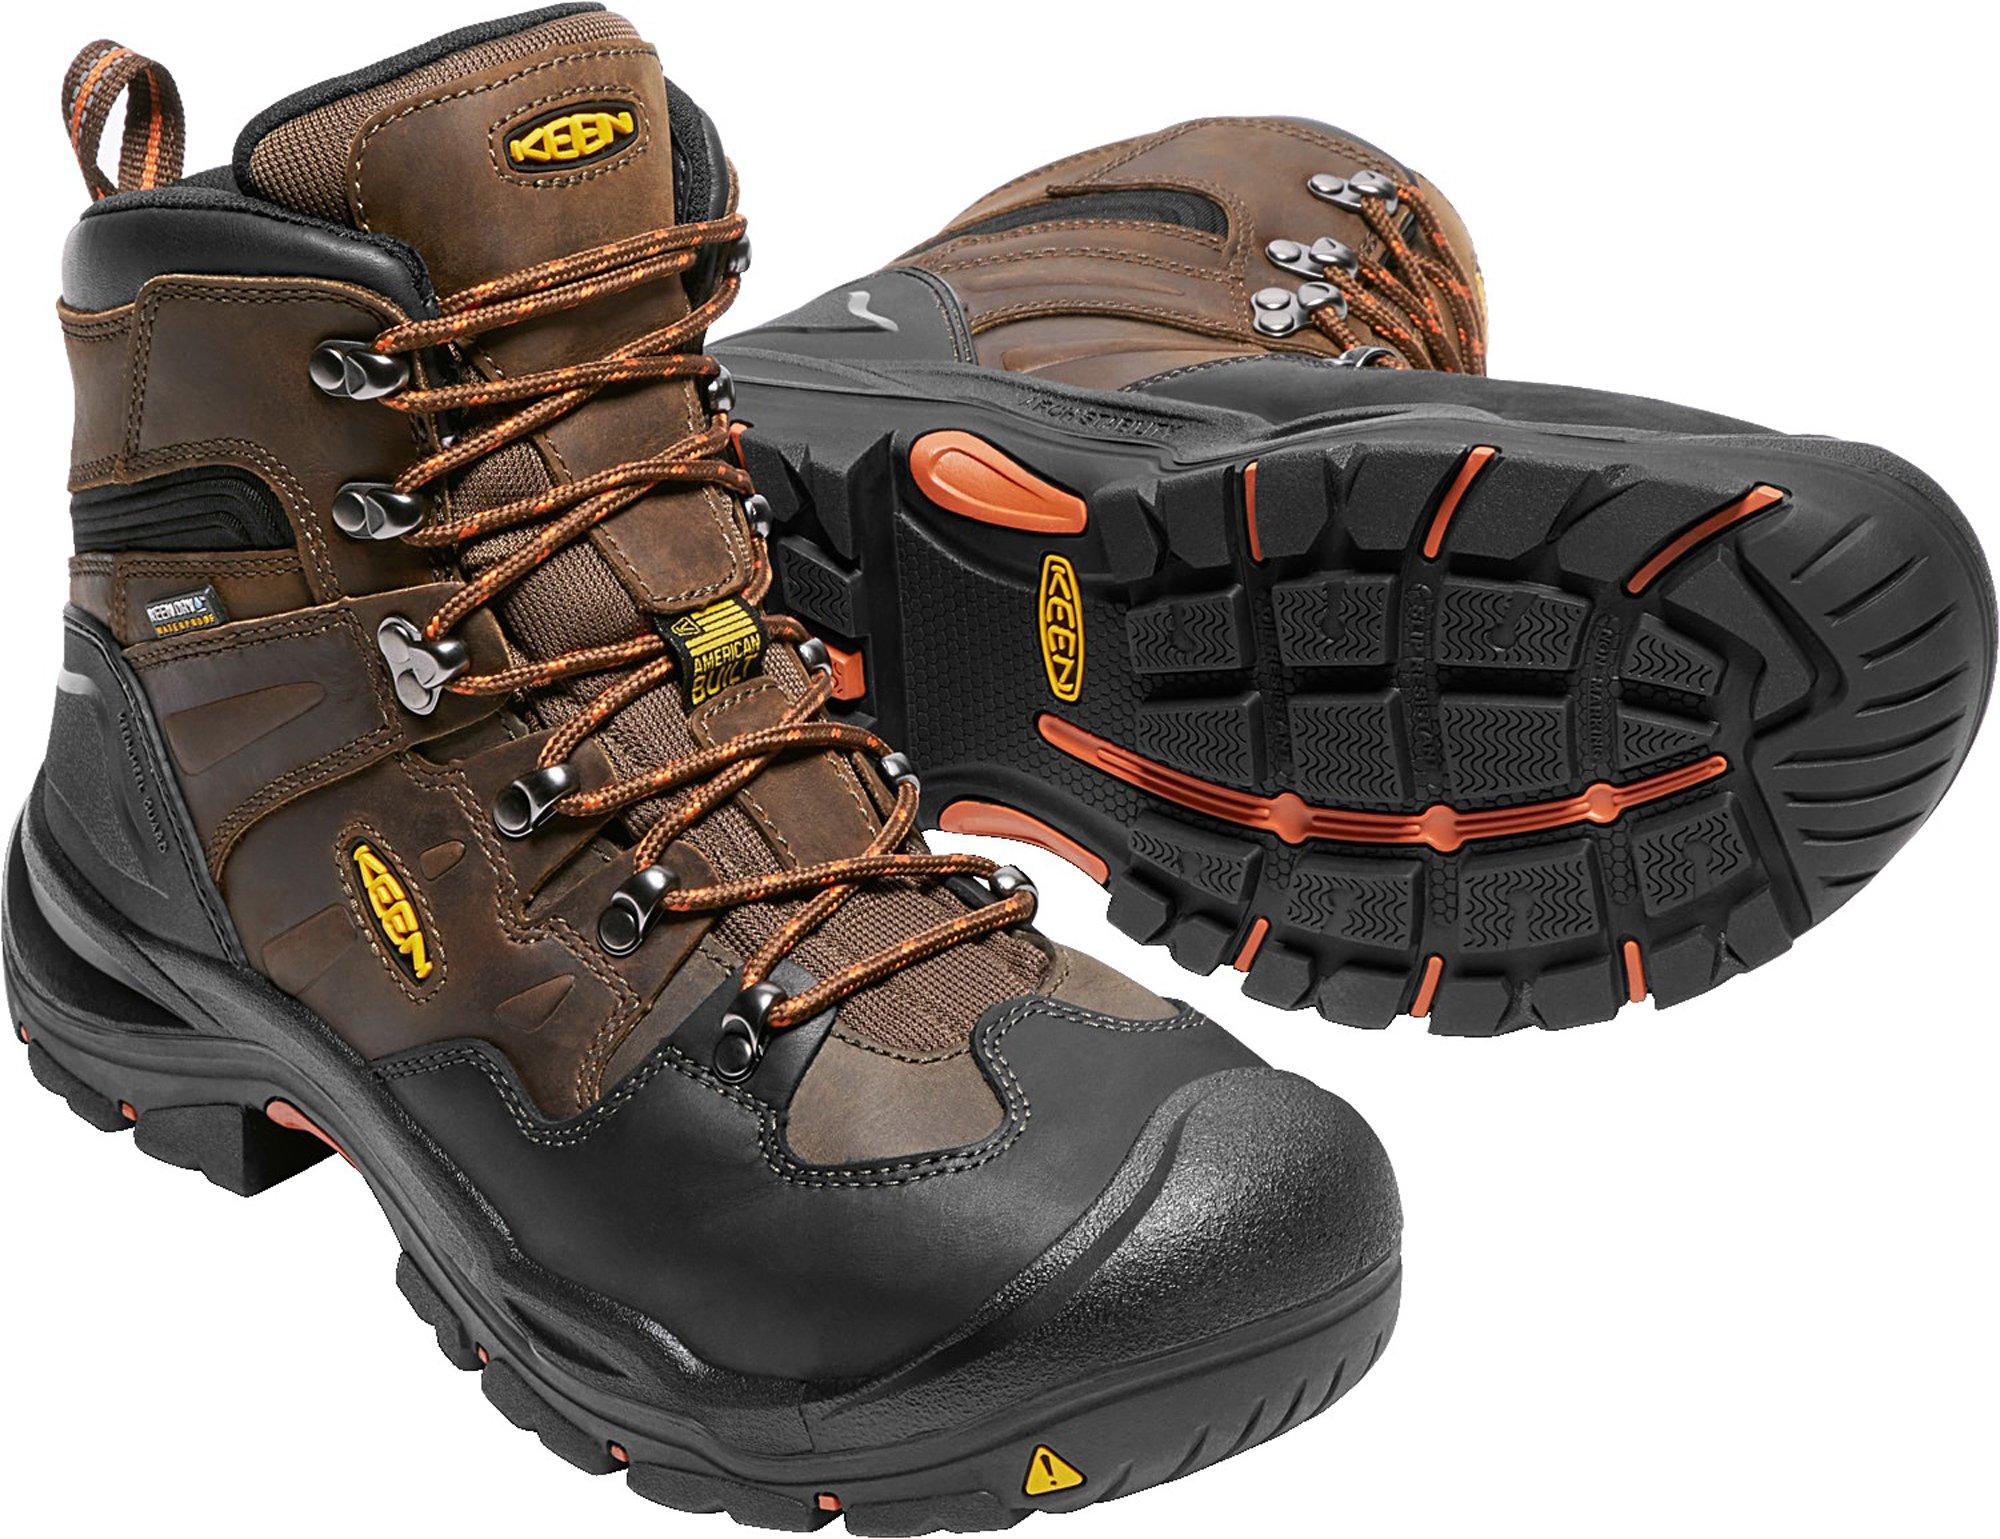 KEEN Utility Coburg 6'' WP (Steel Toe), Men's Work Boot, Cascade Brown/Brindle, 8 EE by KEEN Utility (Image #3)